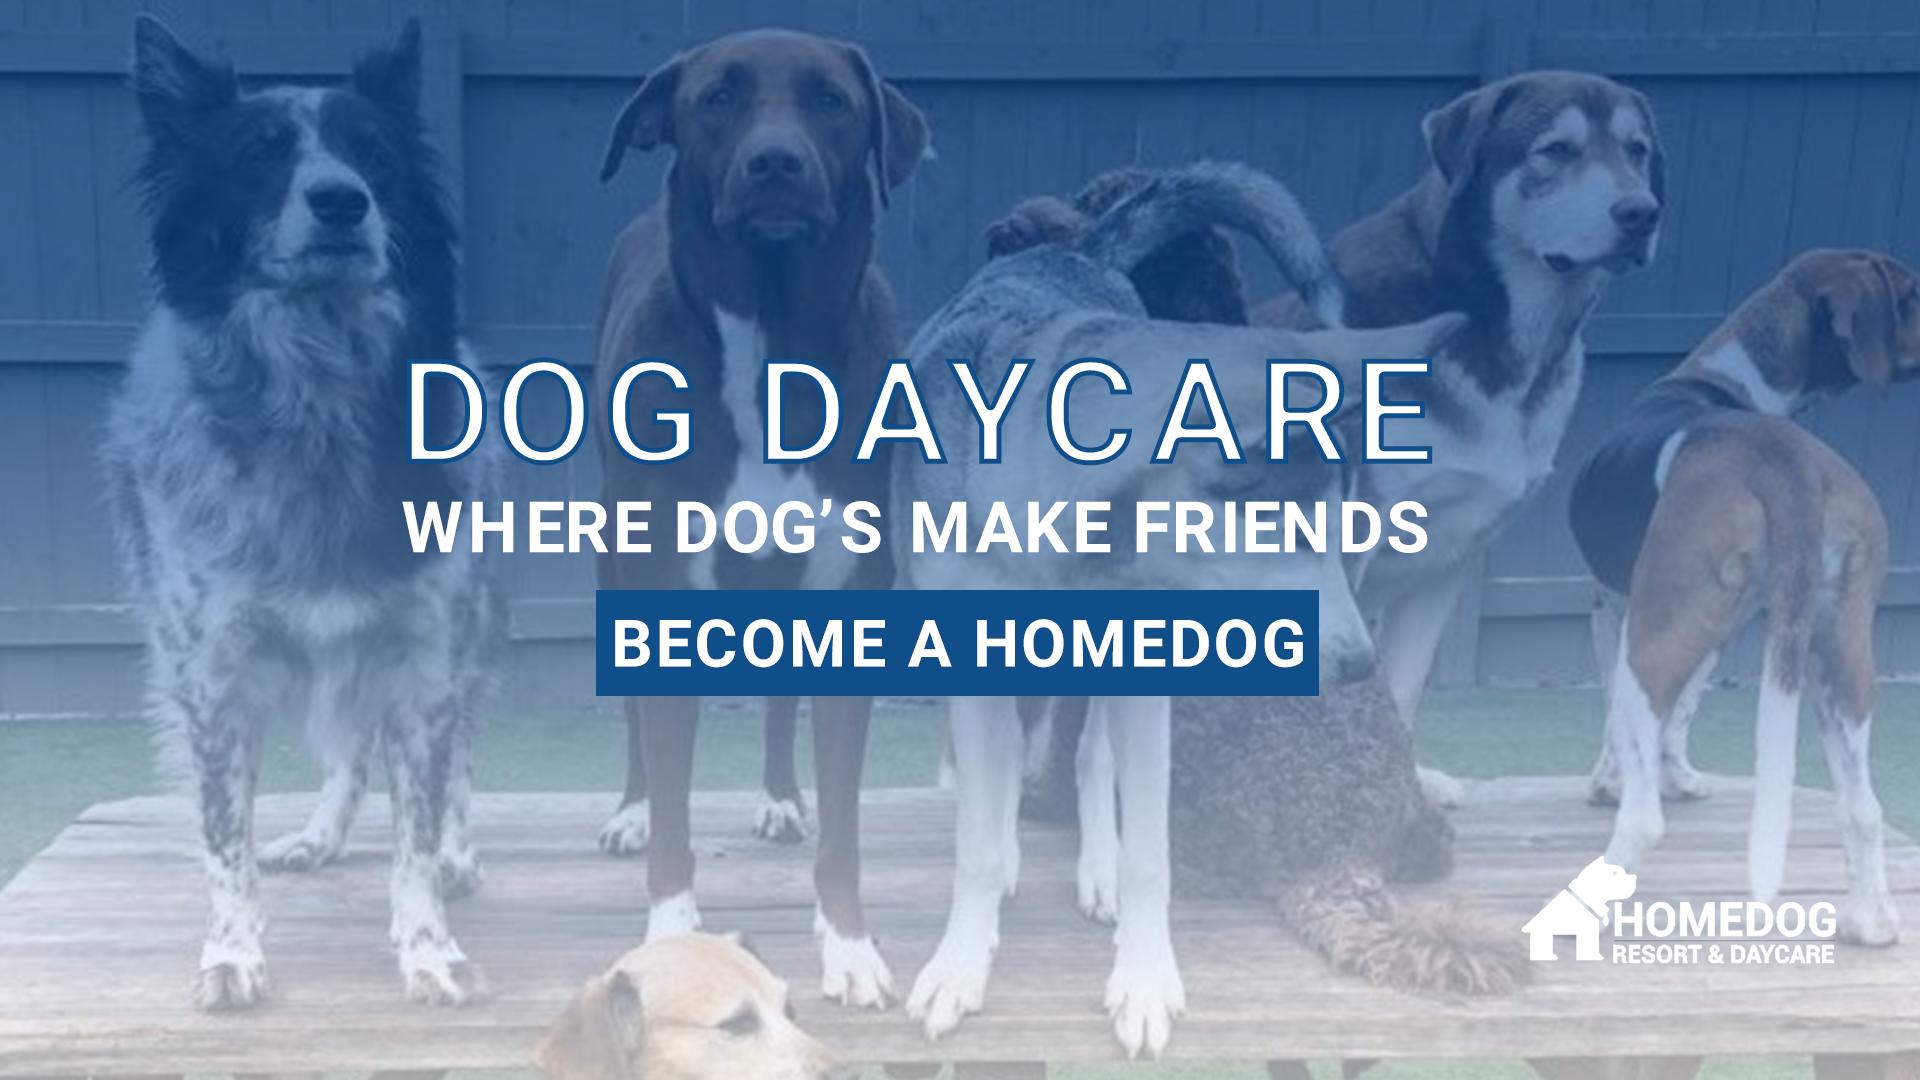 dogs enjoying dog daycare at homedog resort & daycare in downtown Columbus, Ohio